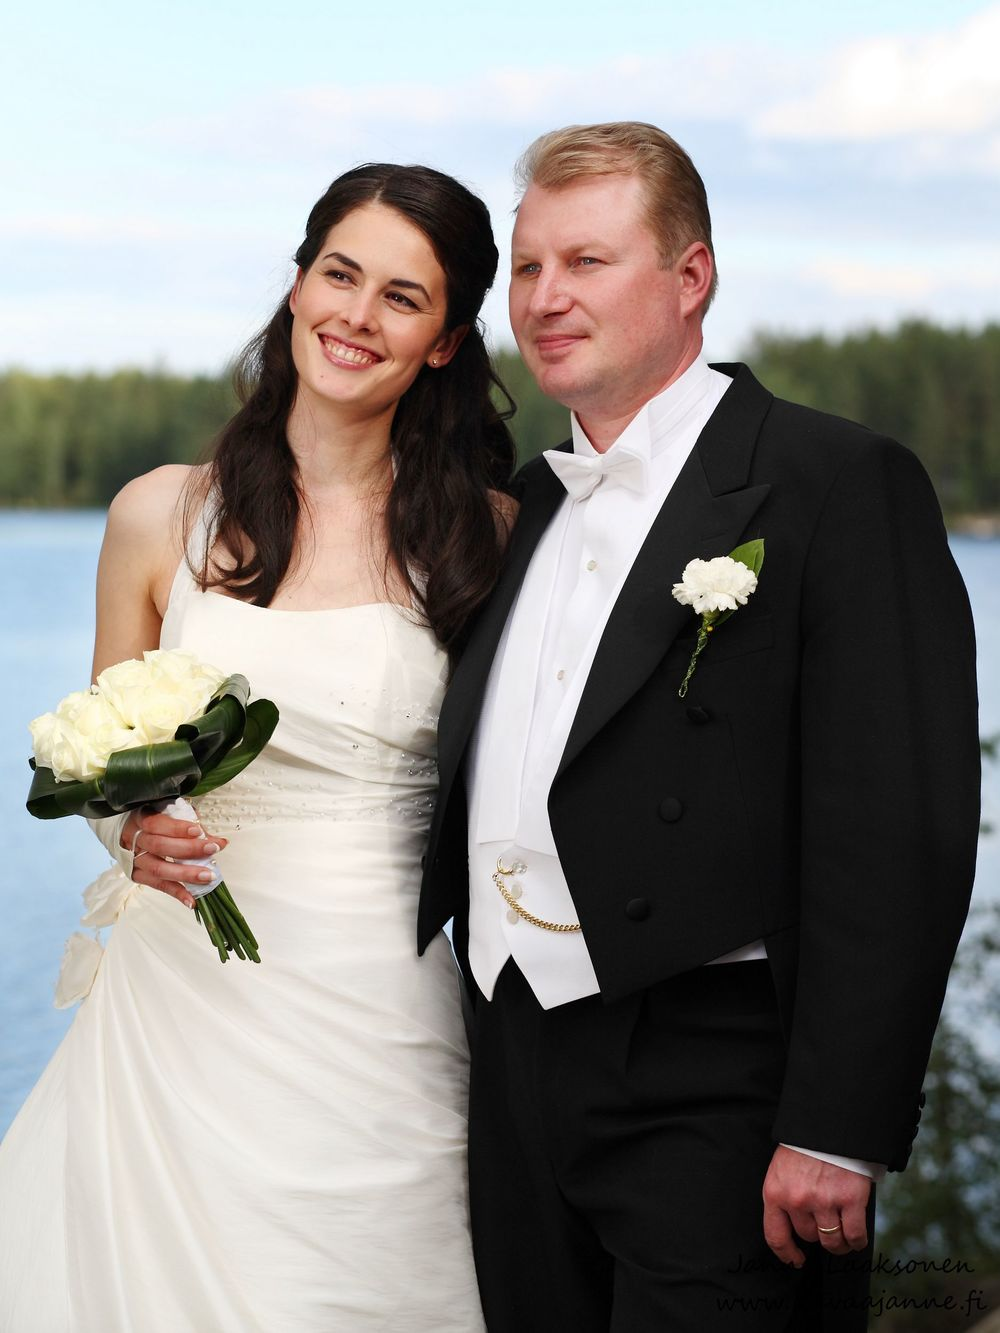 Hääpotretti Juupajoella. Valokuvaaja Janne Laaksonen, KuvaaJanne Ky, Riihimäki